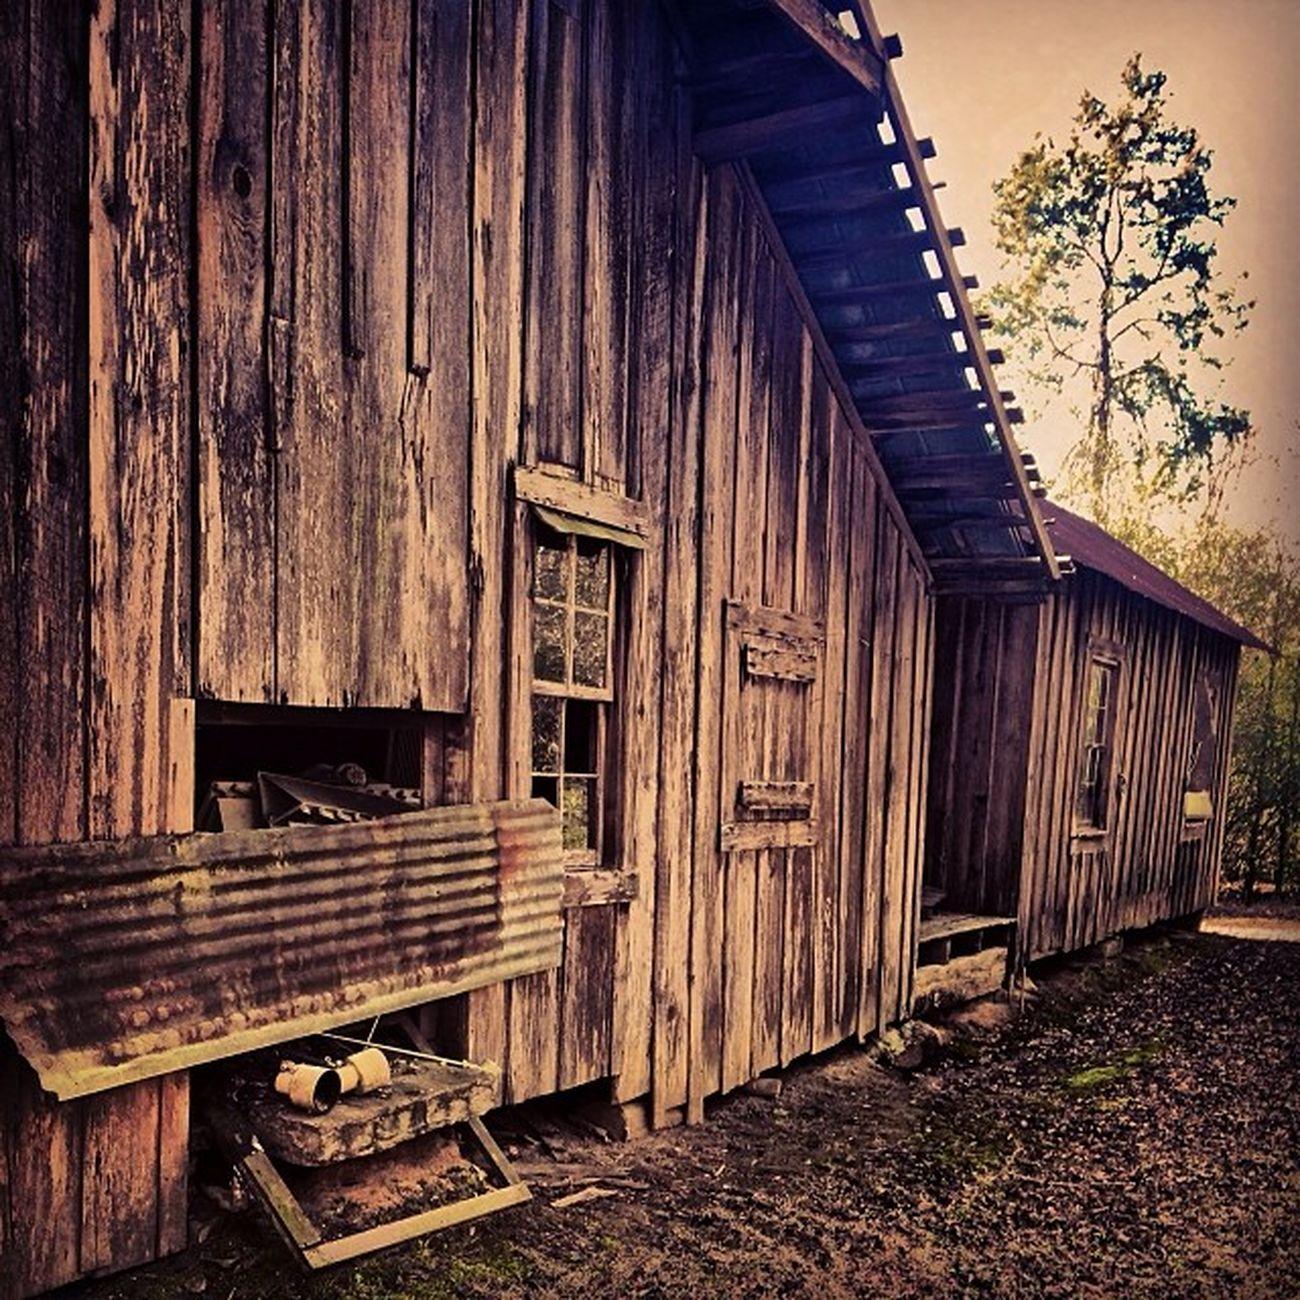 Nexus_army Filthyfarms Bpa_rural Outcastamerica_rural Rurex_revolution Rustic_wonders Rural_love Pocket_abandoned Jj_louisiana_046 Trb_love_shack_baby Rsa_rural_grunge